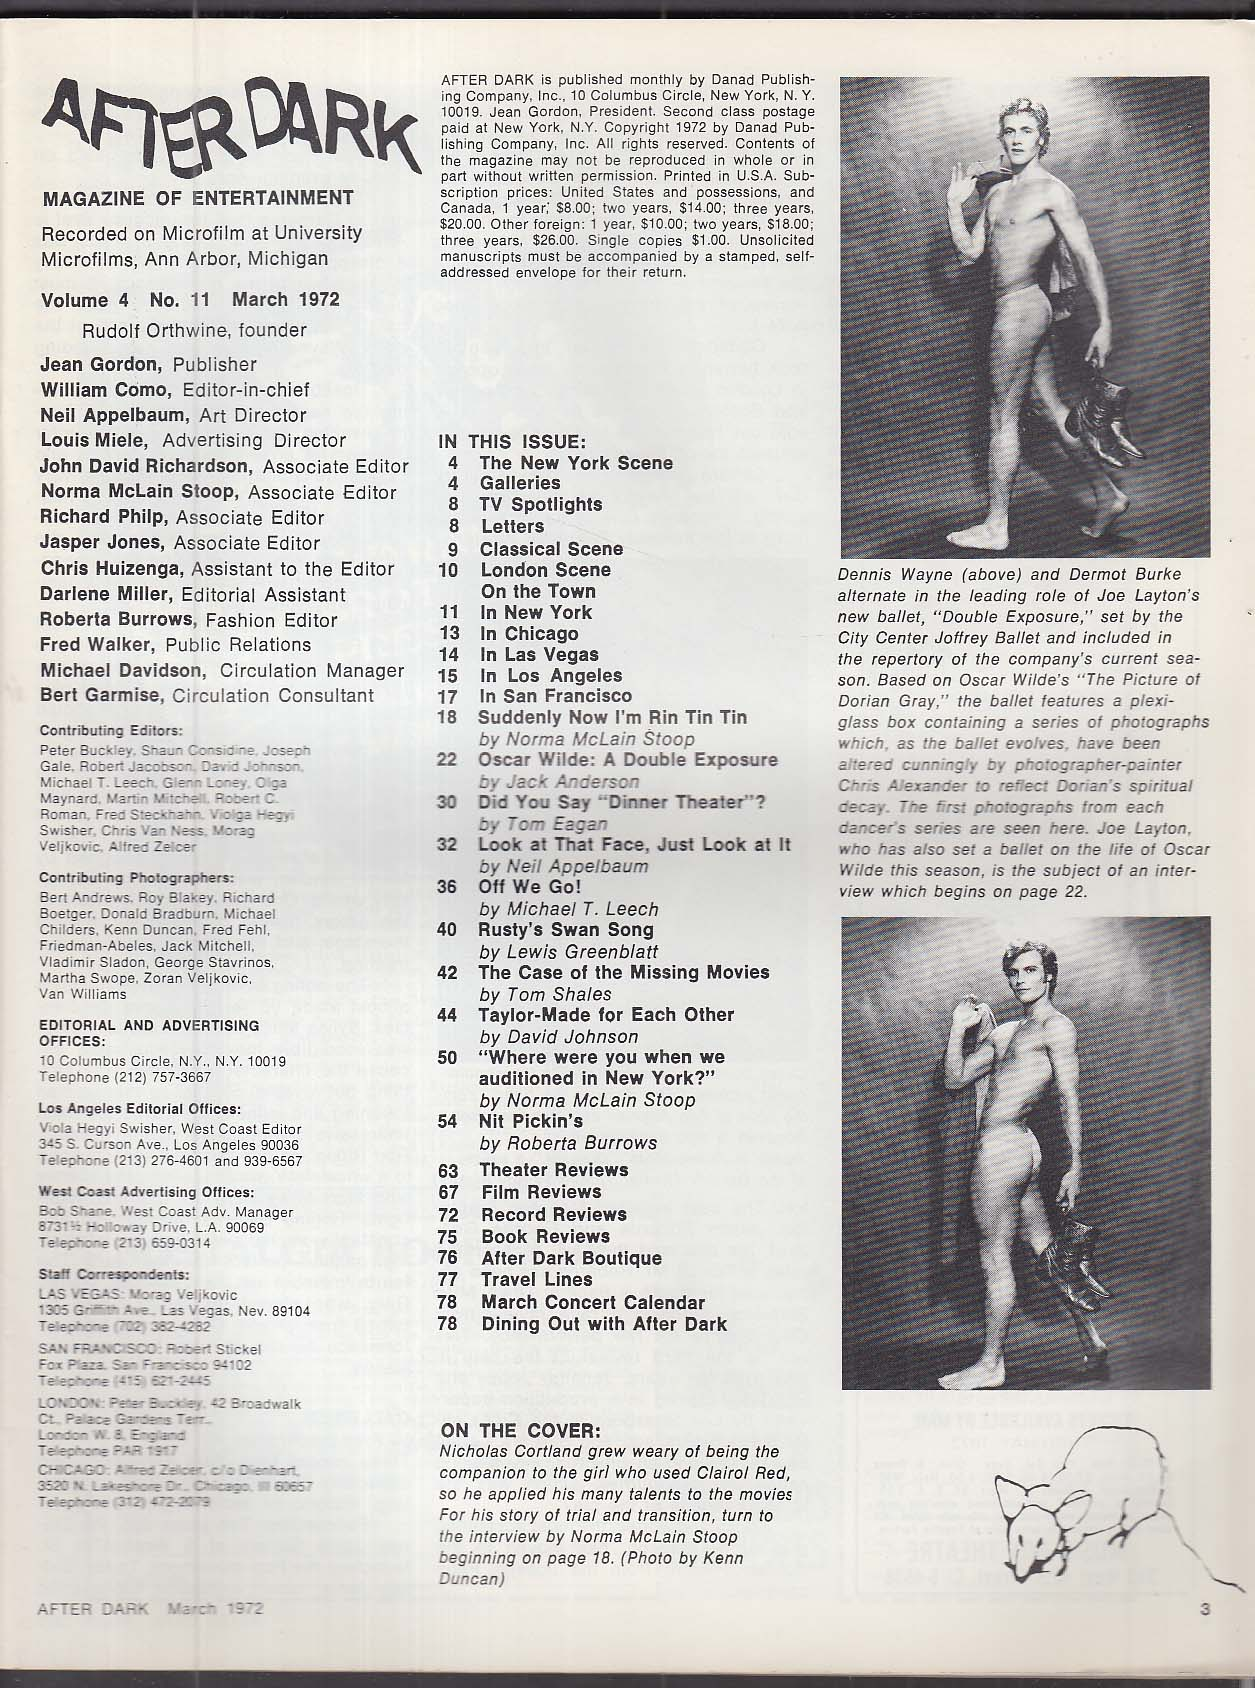 AFTER DARK Nicky Cortland Joffrey Ballet James Brolin Renee Taylor 3 1972